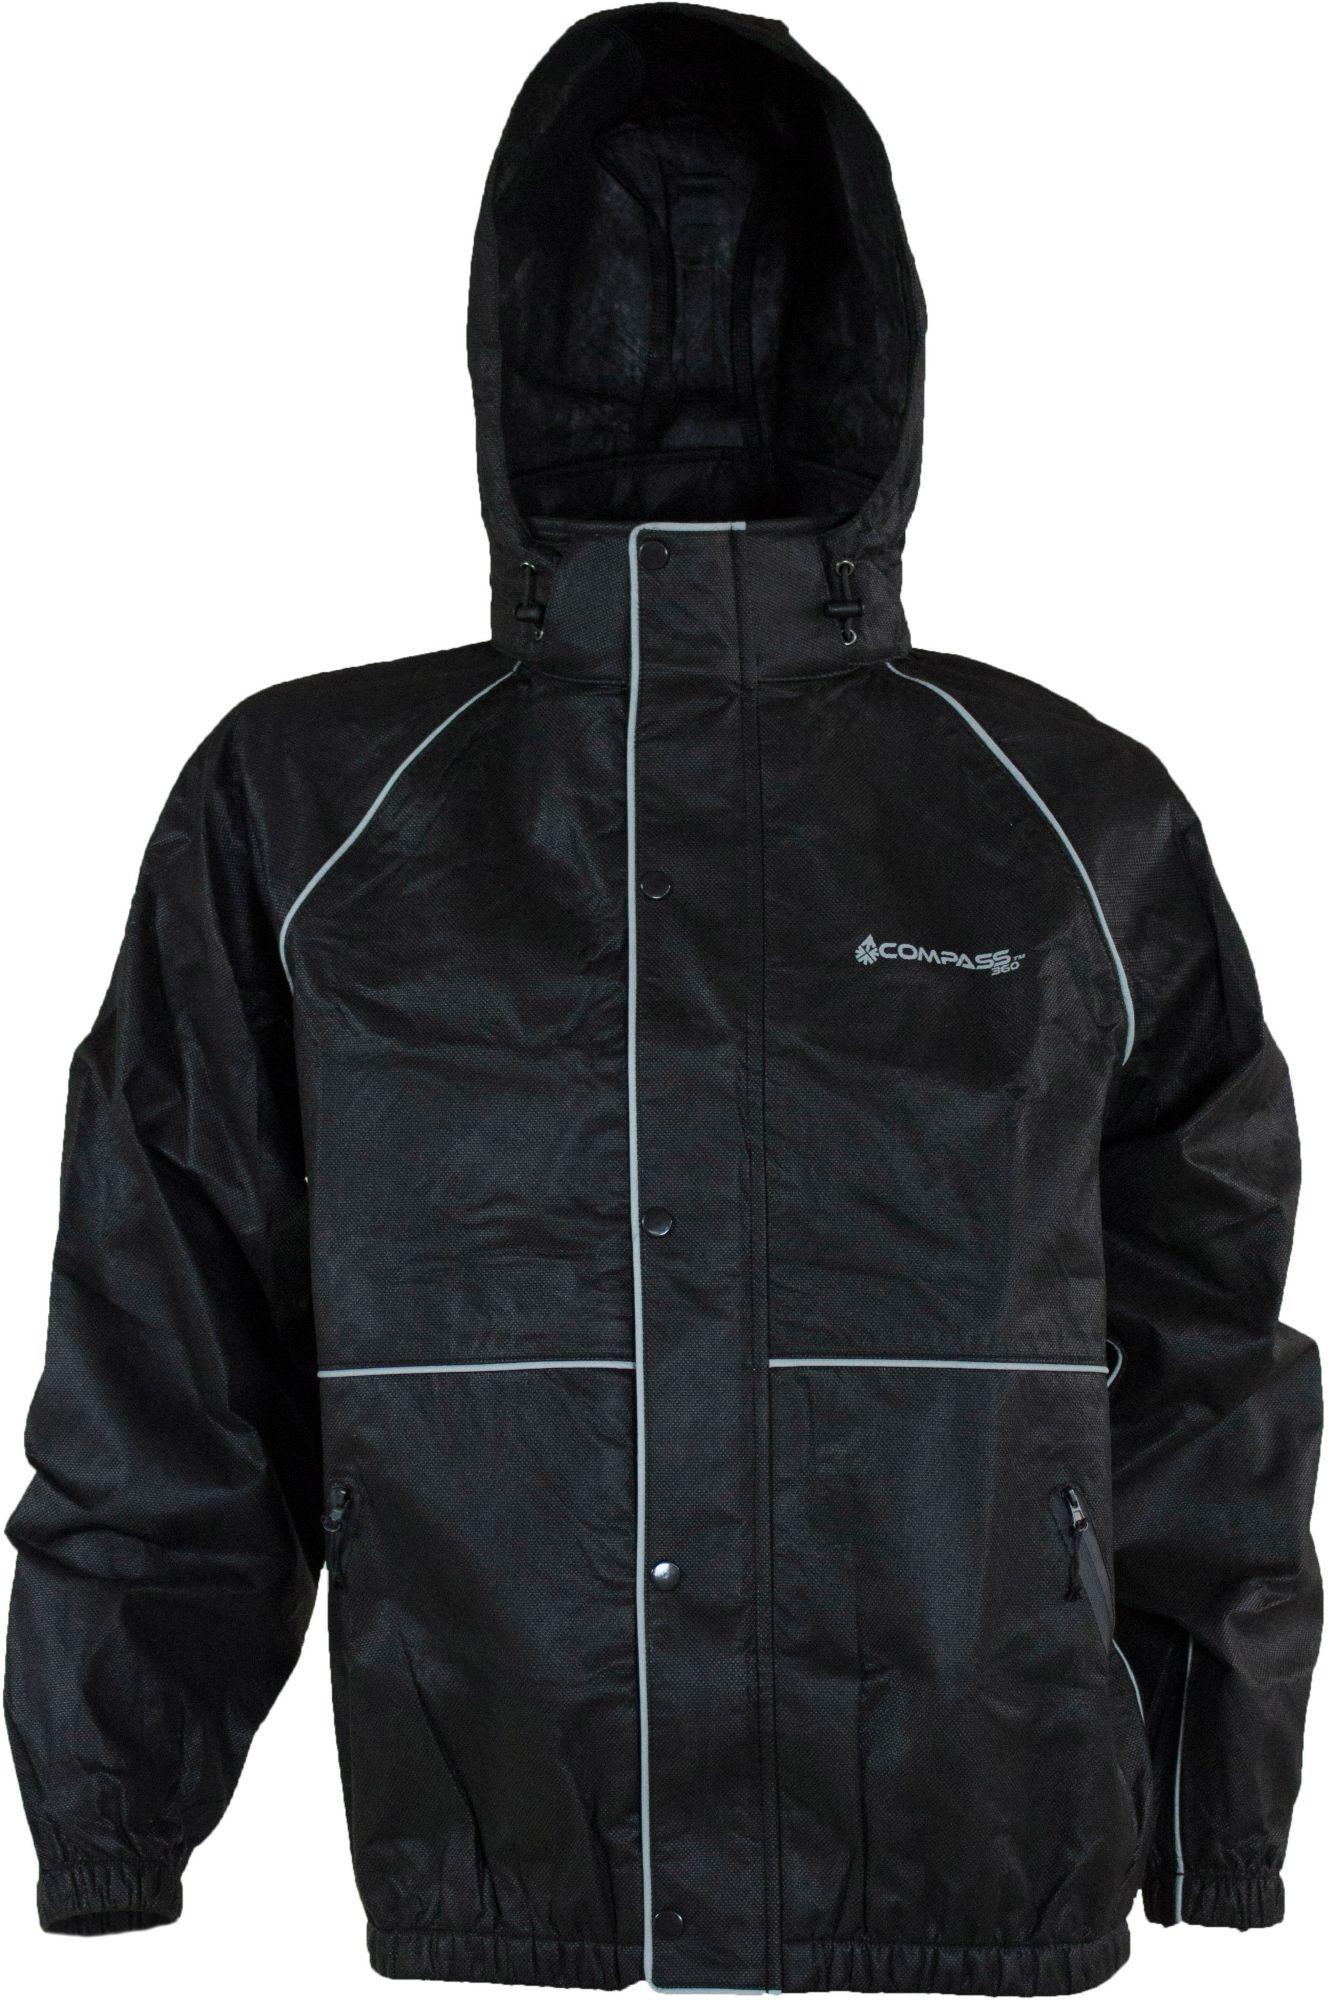 Compass 360 ROADTEK Reflective Waterproof Breathable Rain Jacket, Men's, Size: Medium, Black